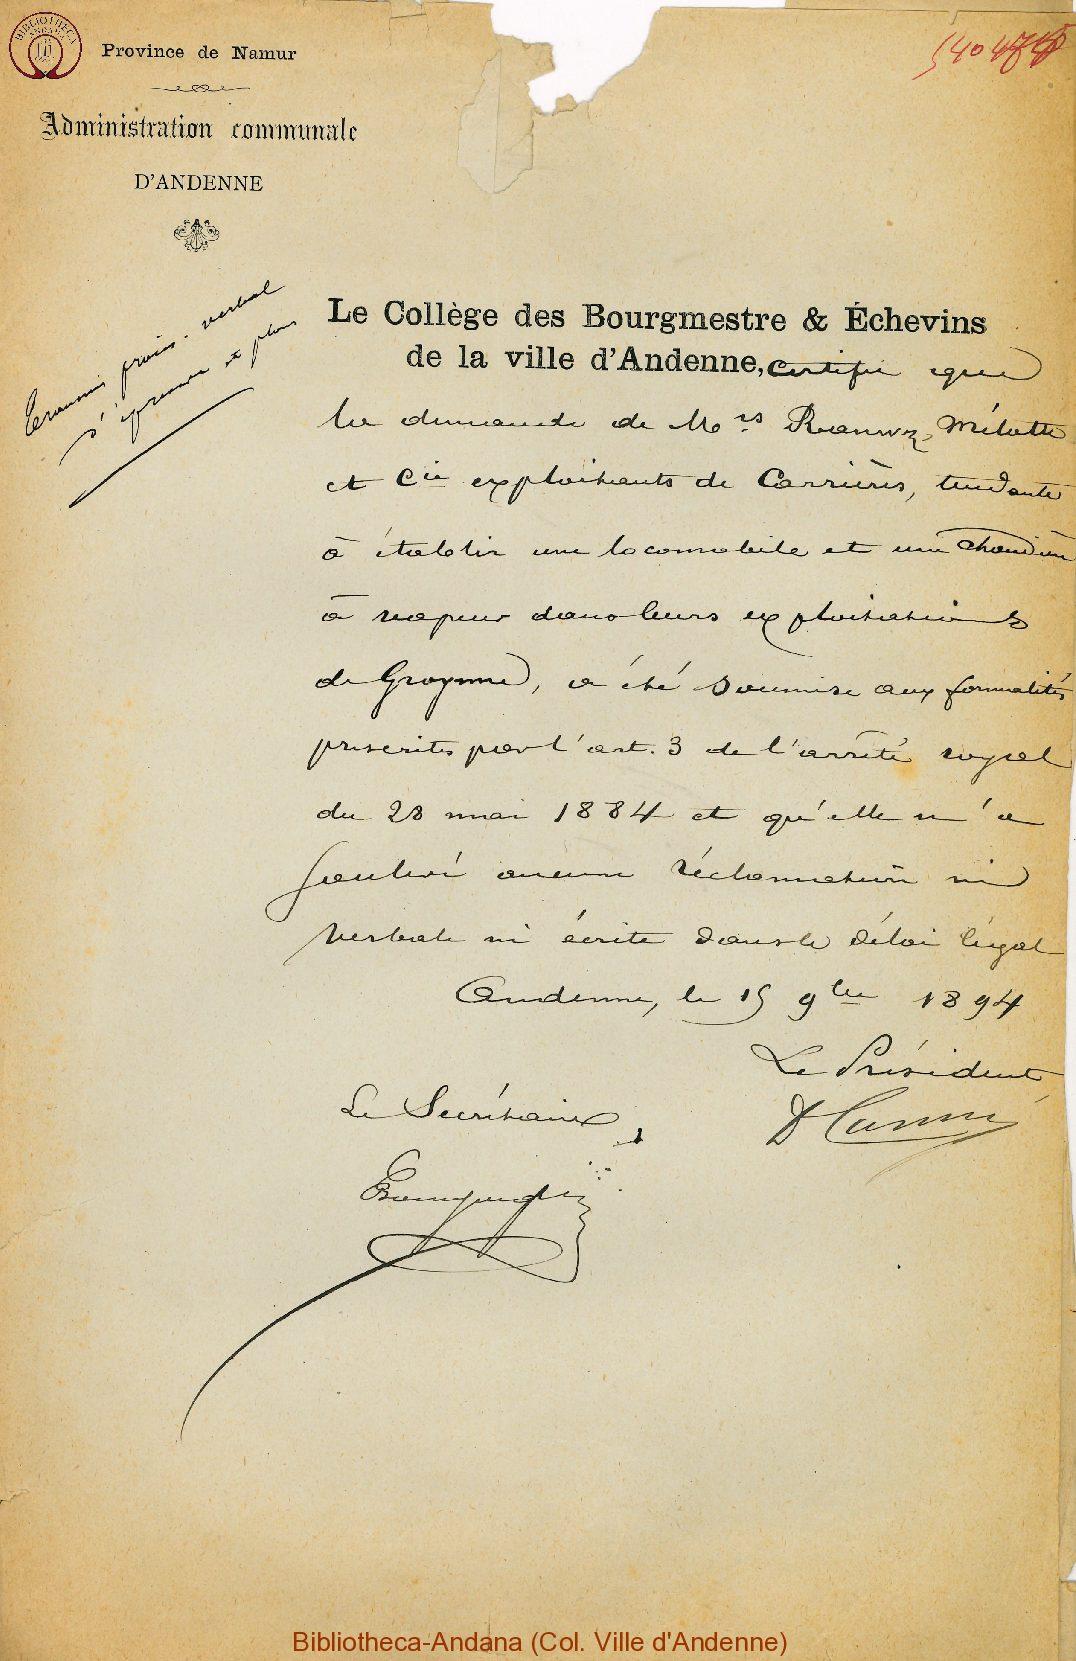 1894-11-15